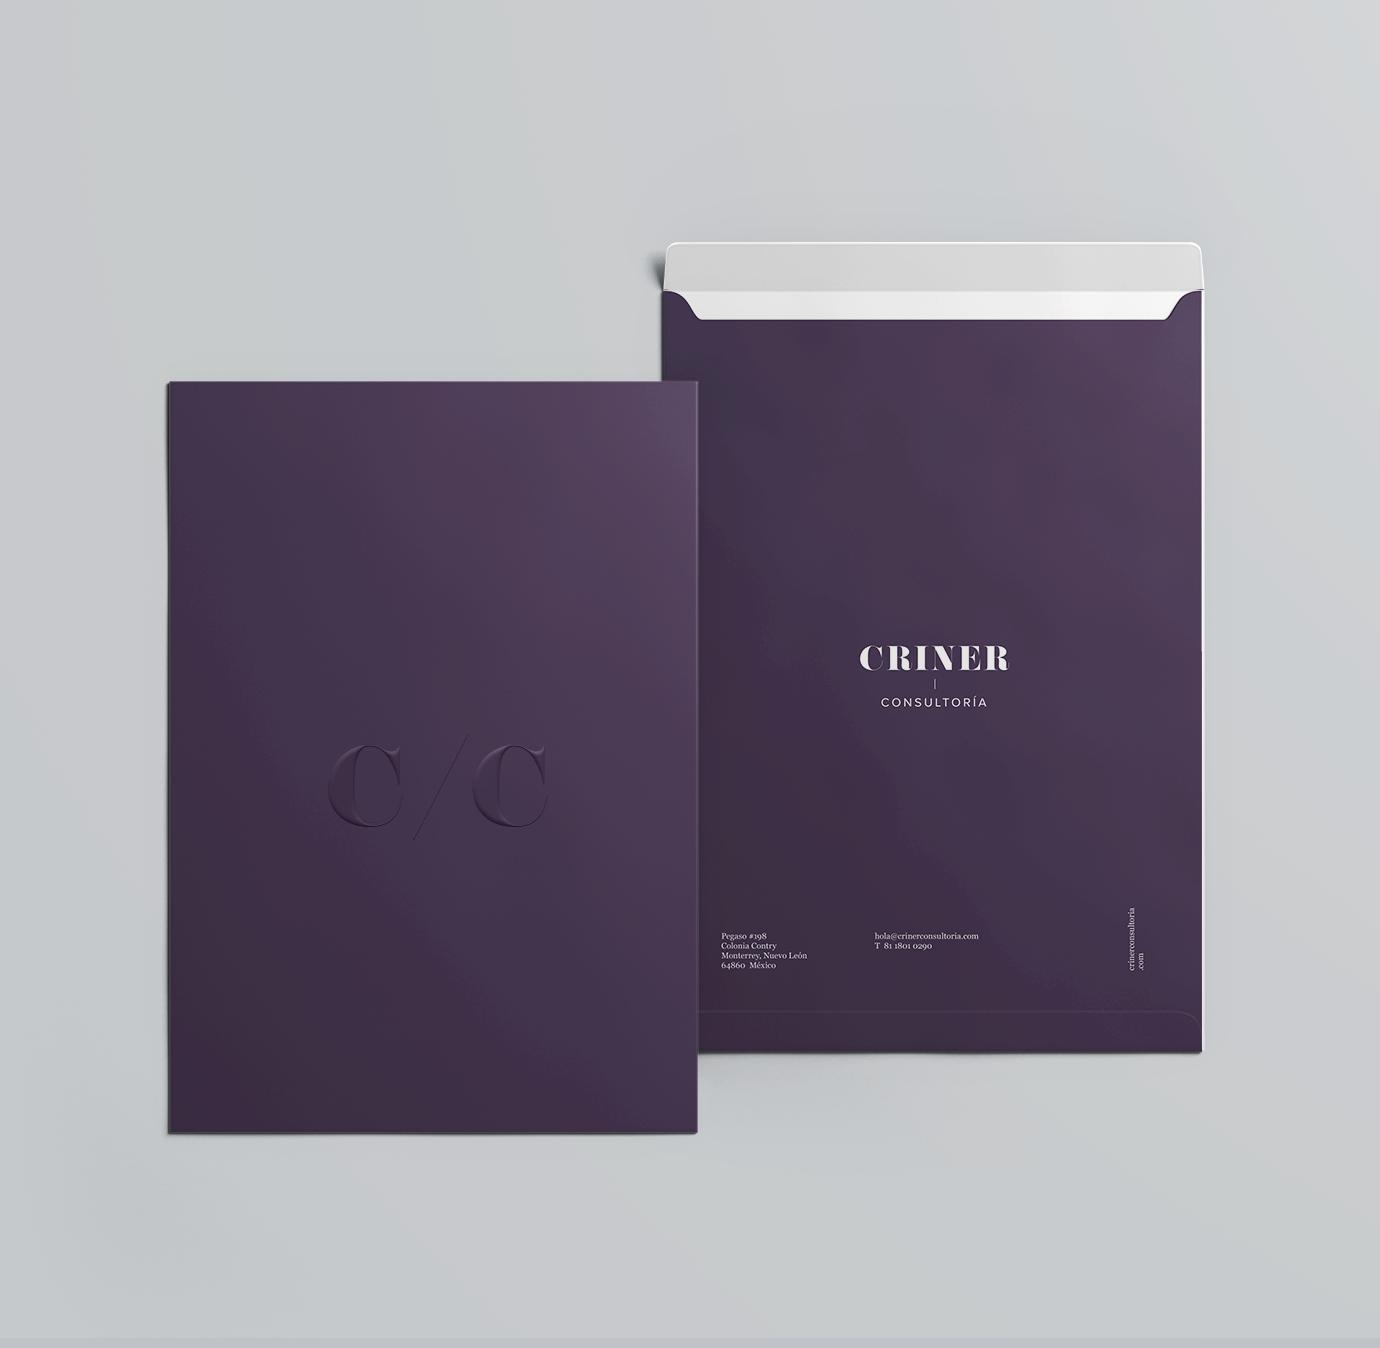 envelope-paper-criner-yoenpaperland